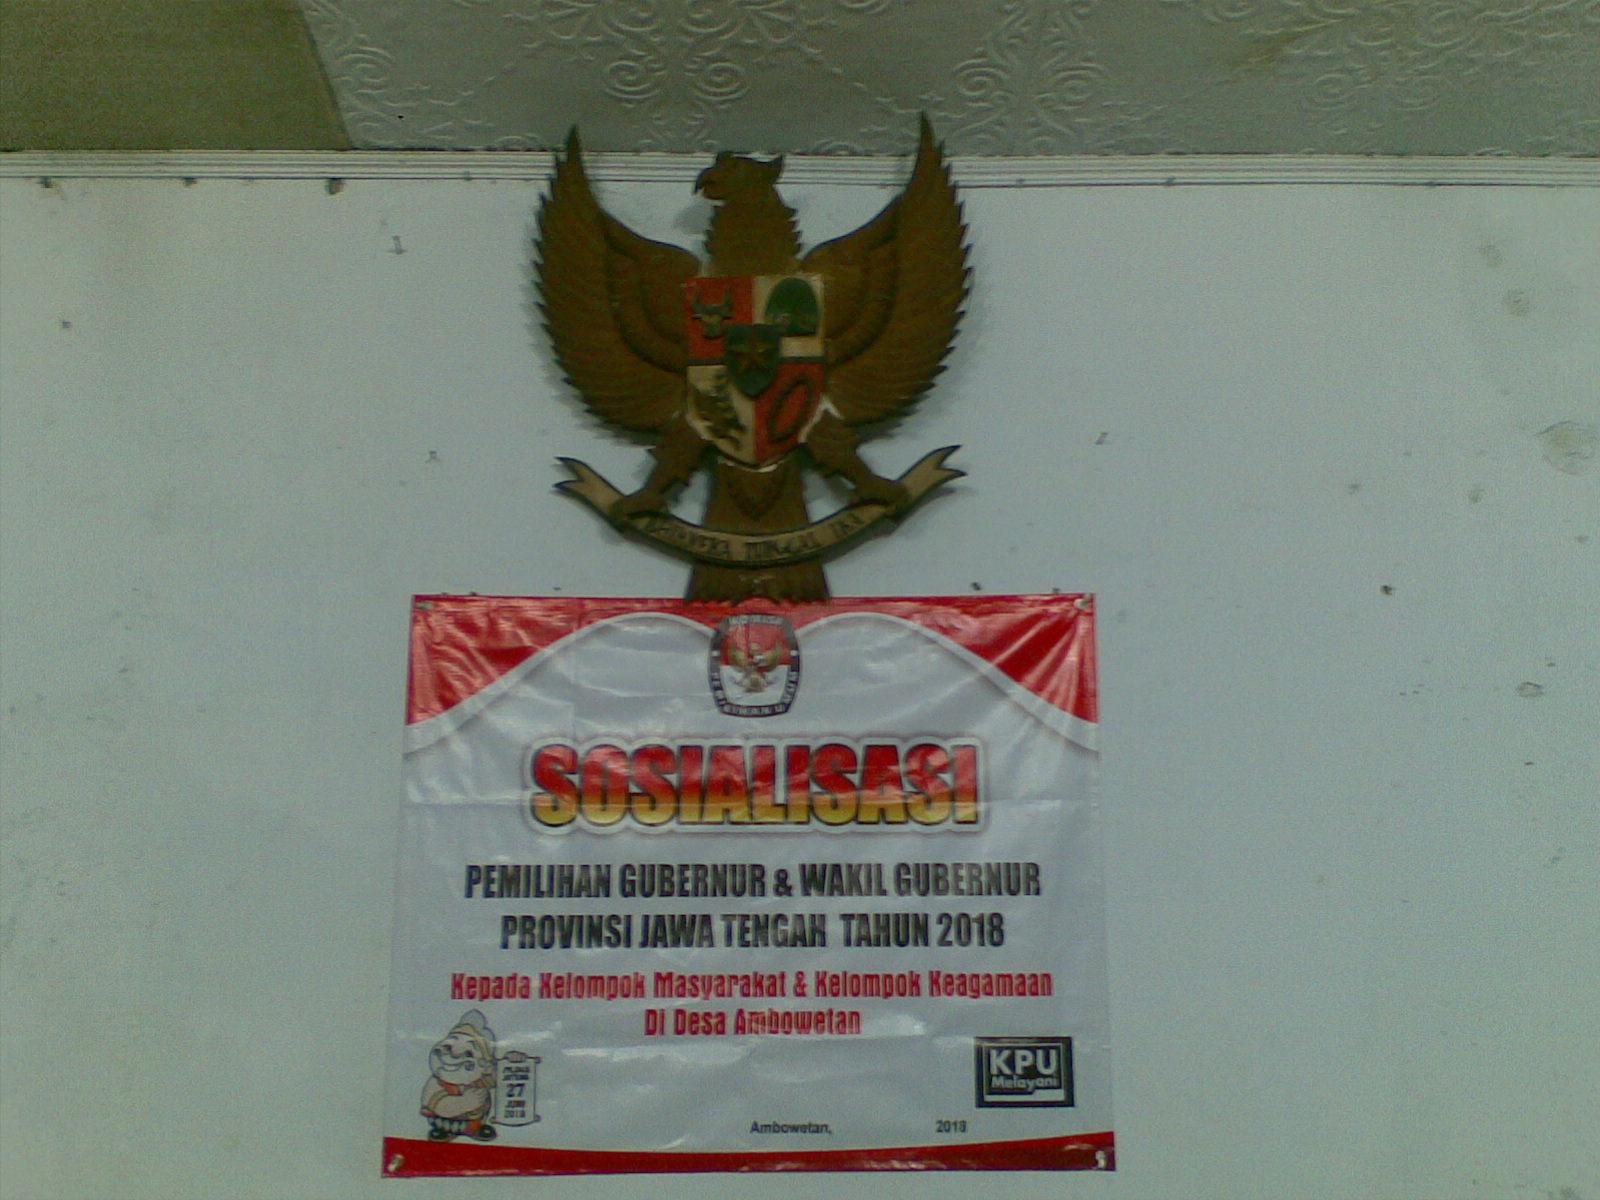 Sosialisasi Pemilihan Gubernur dan Wakil Gubernur Jawa Tengah 2018